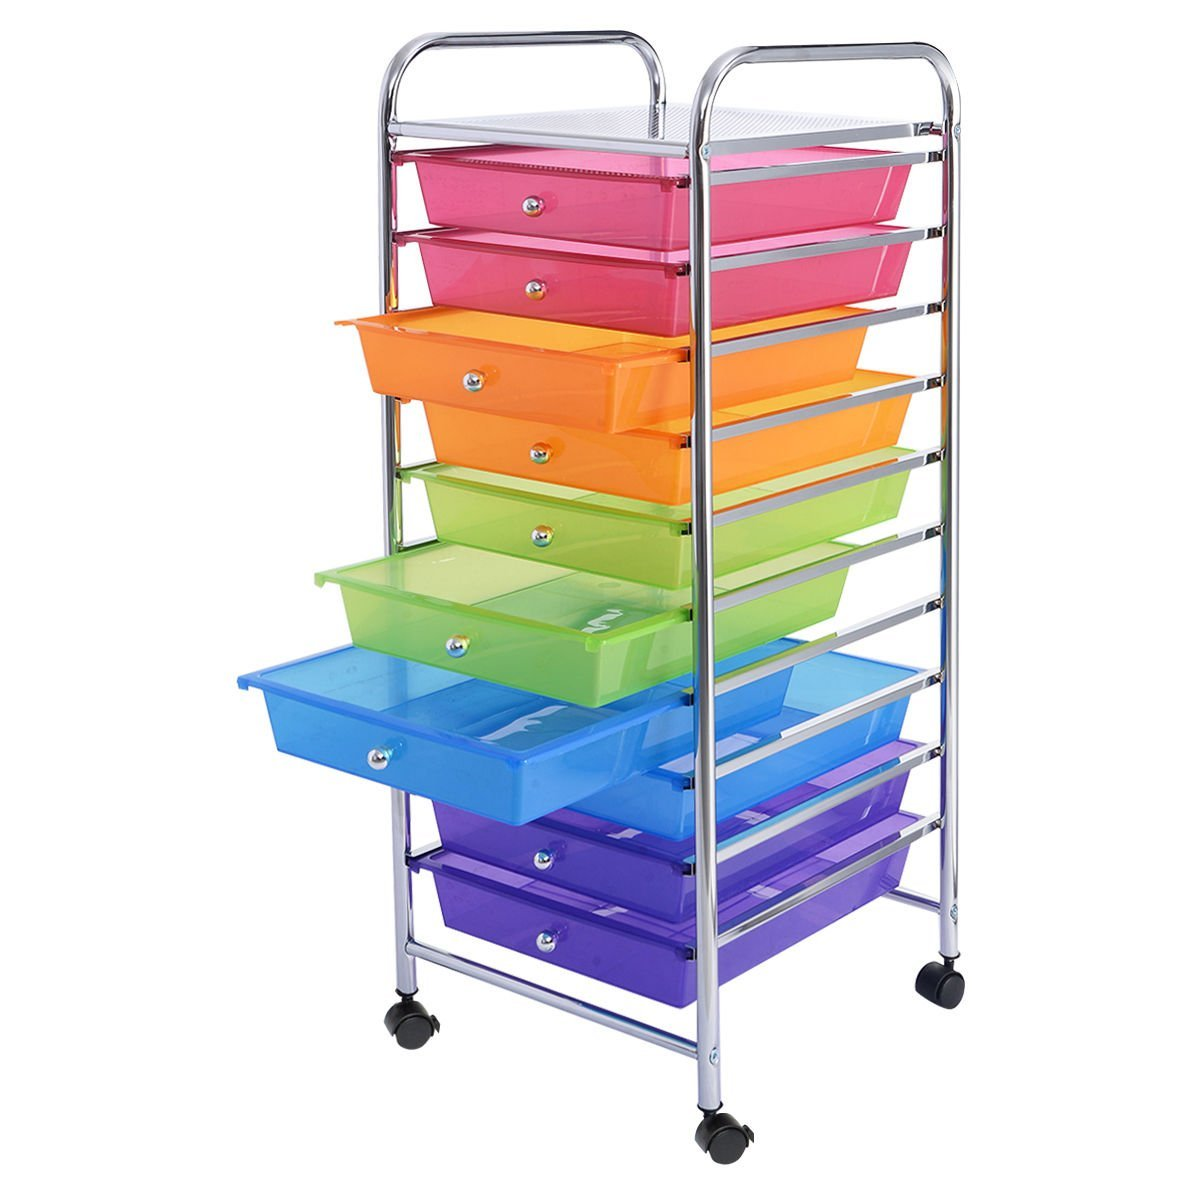 Buy Chrome 10 Drawer Rolling Scrapbook Cart Storage Paper Organizer